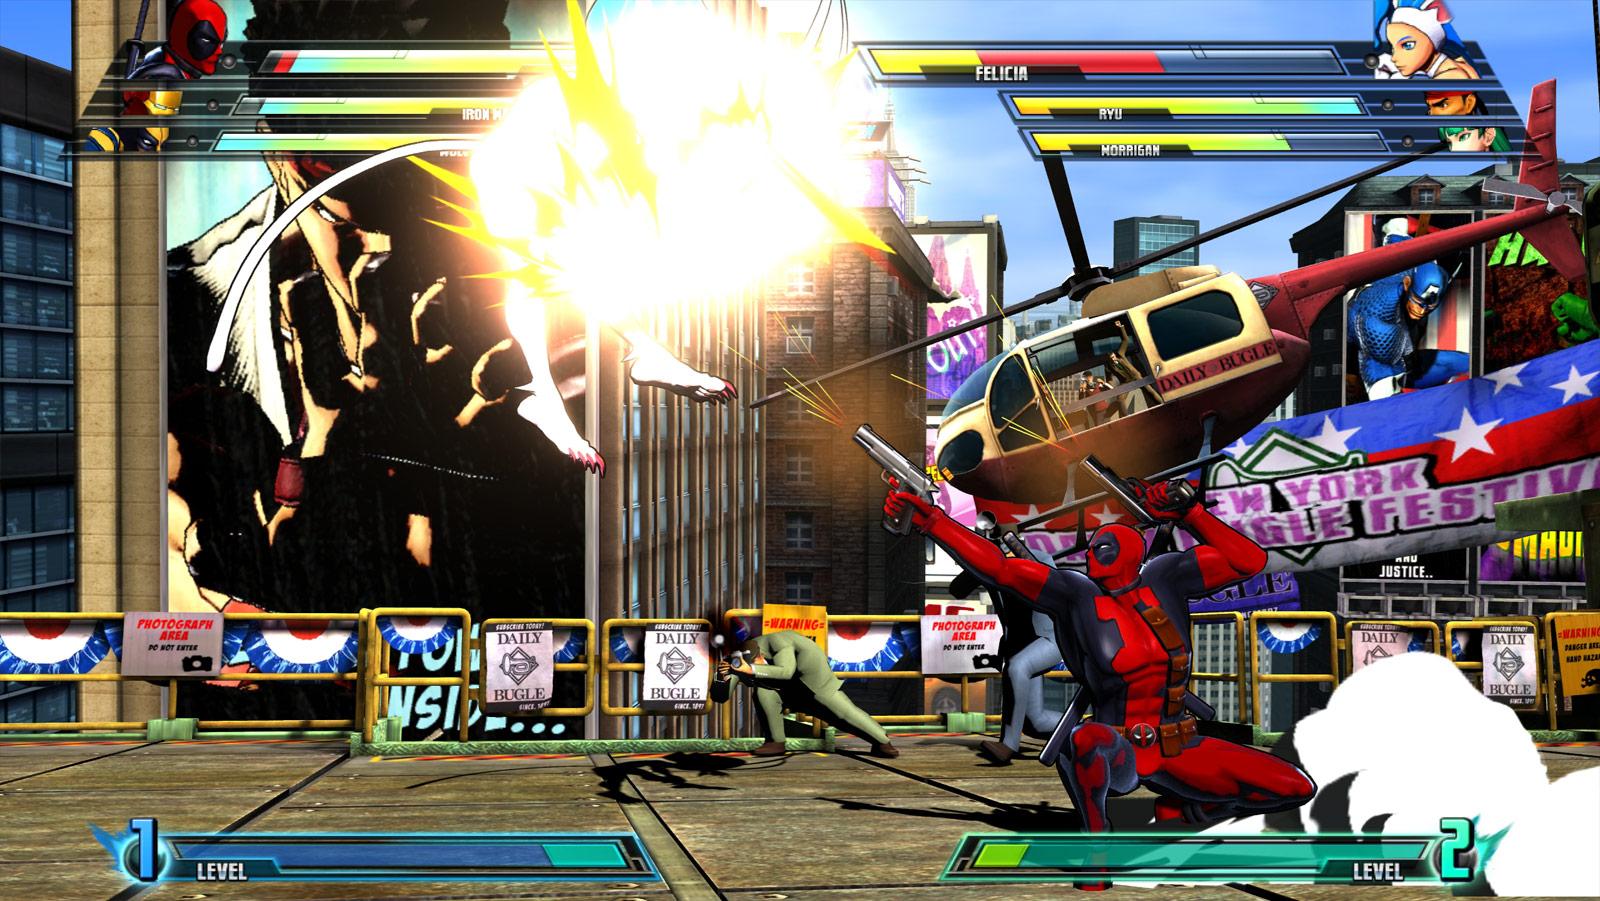 Marvel vs. Capcom 3 screen shot from E3 image #3